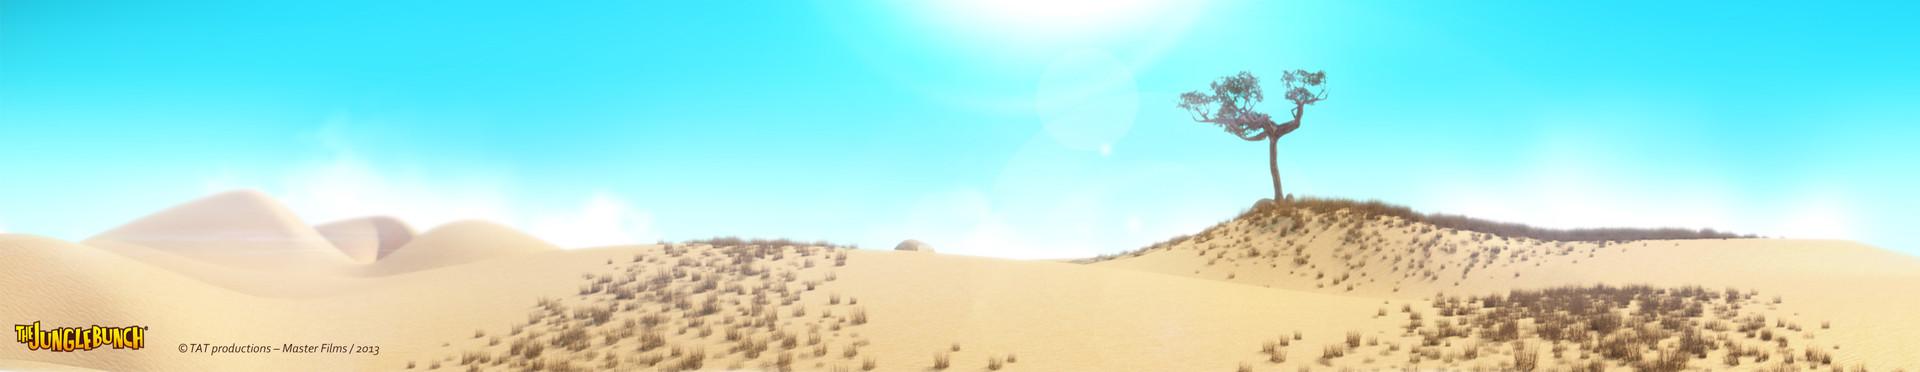 Mickael lelievre savannah desert pano 02